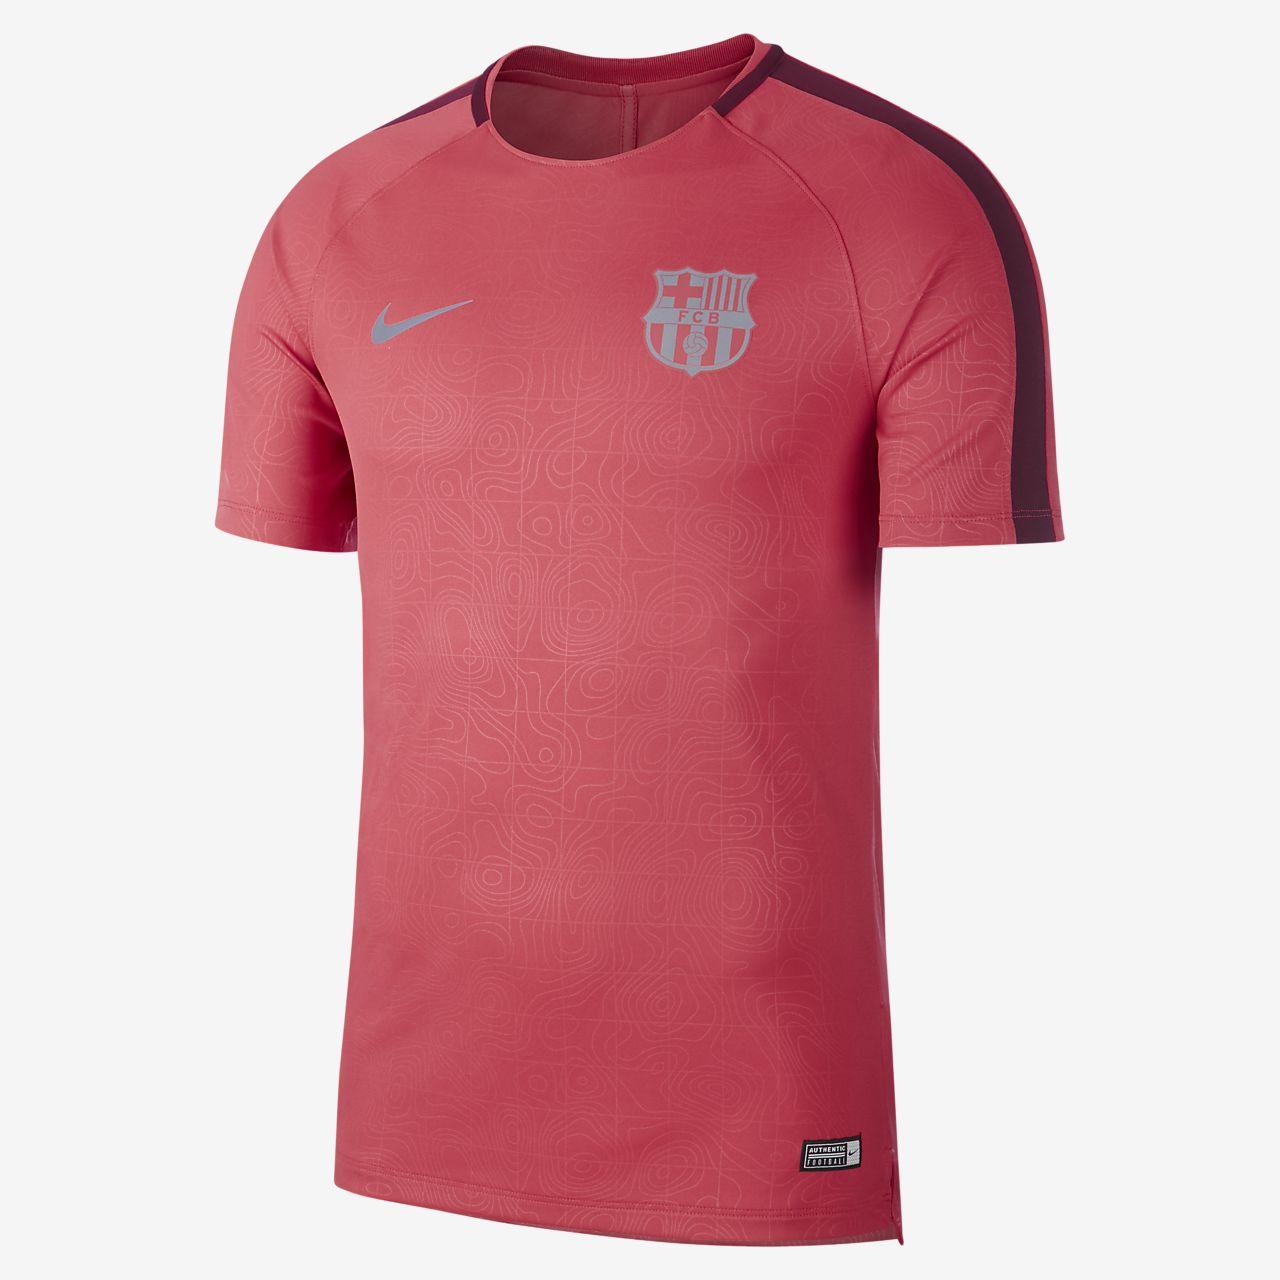 34e6e5729d8ac ... FC Barcelona Dri-FIT Squad Camiseta de fútbol de manga corta - Hombre